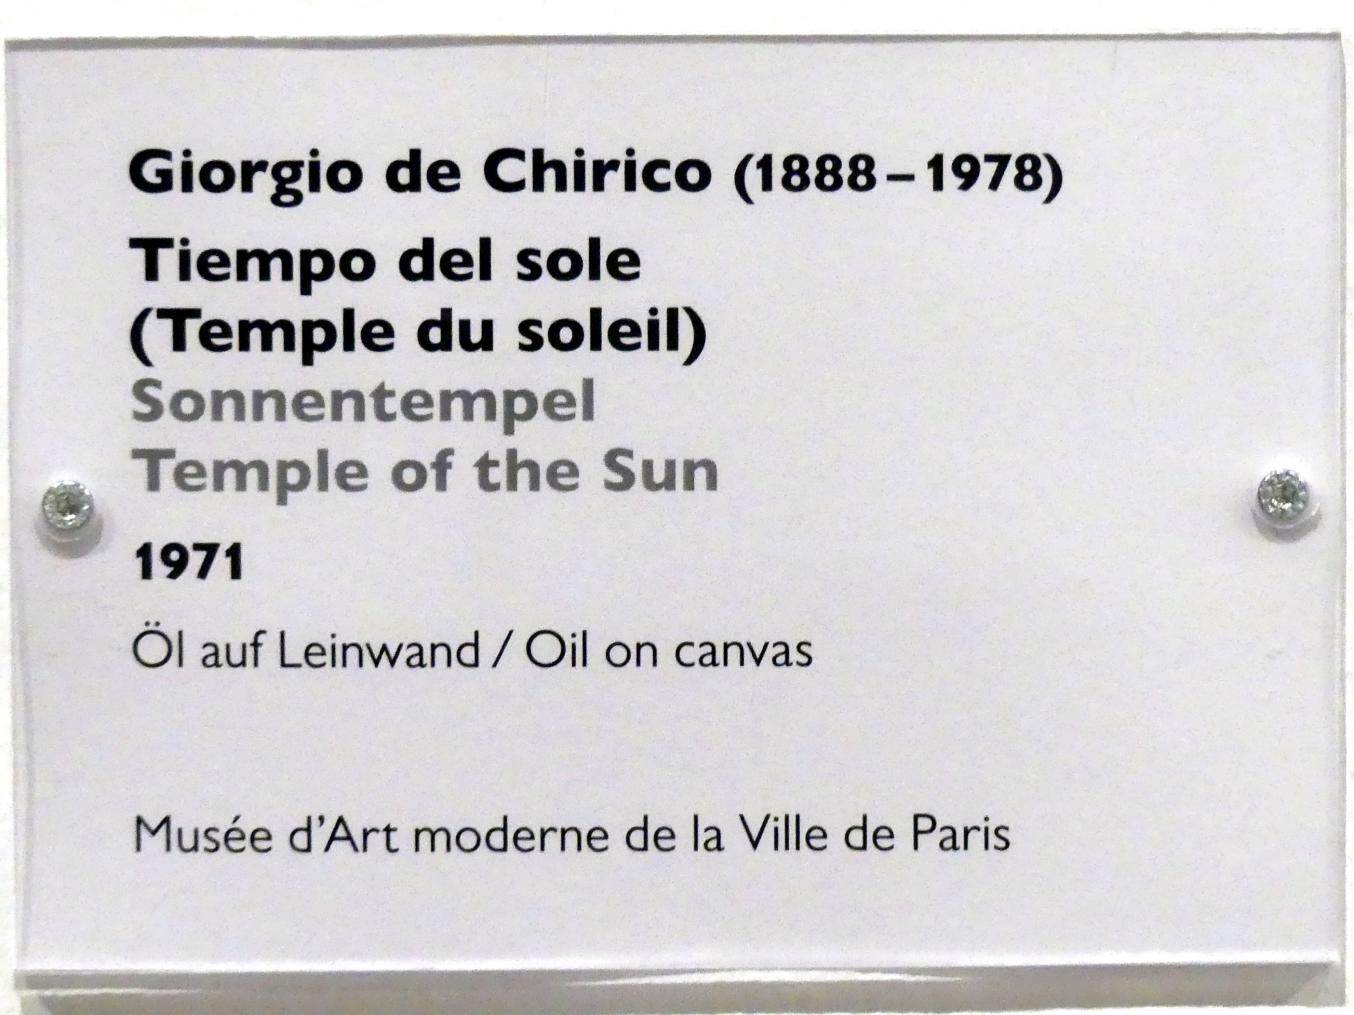 Giorgio de Chirico: Sonnentempel, 1971, Bild 2/2